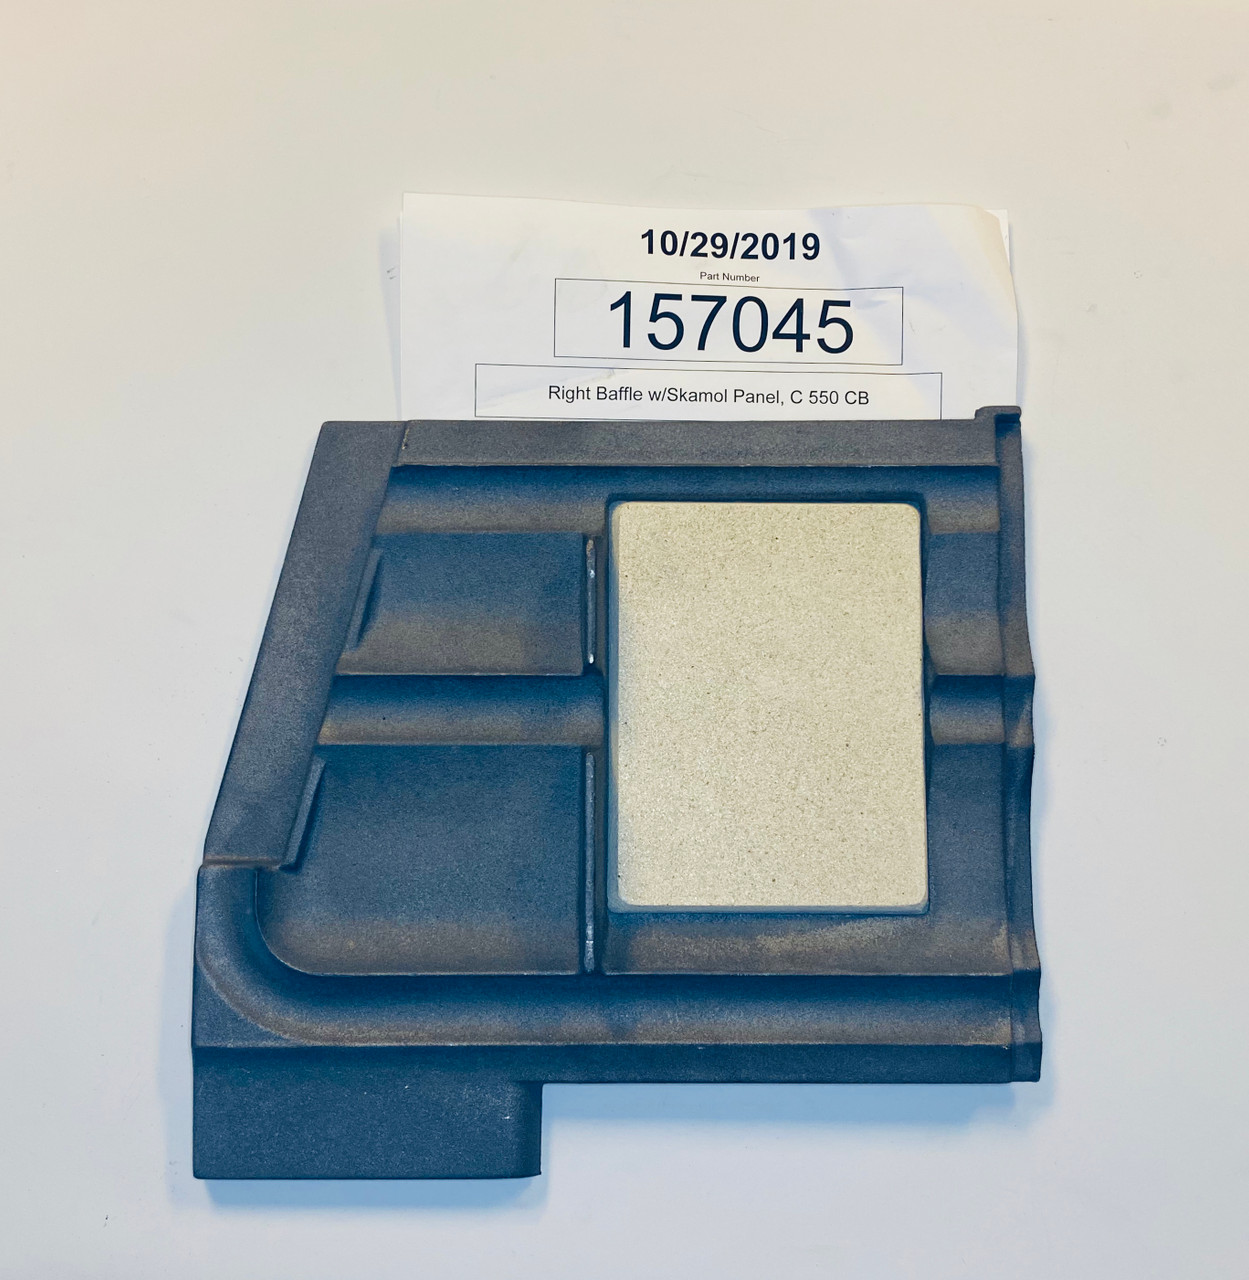 Jotul C550 RH Baffle Plate 157045 bottom